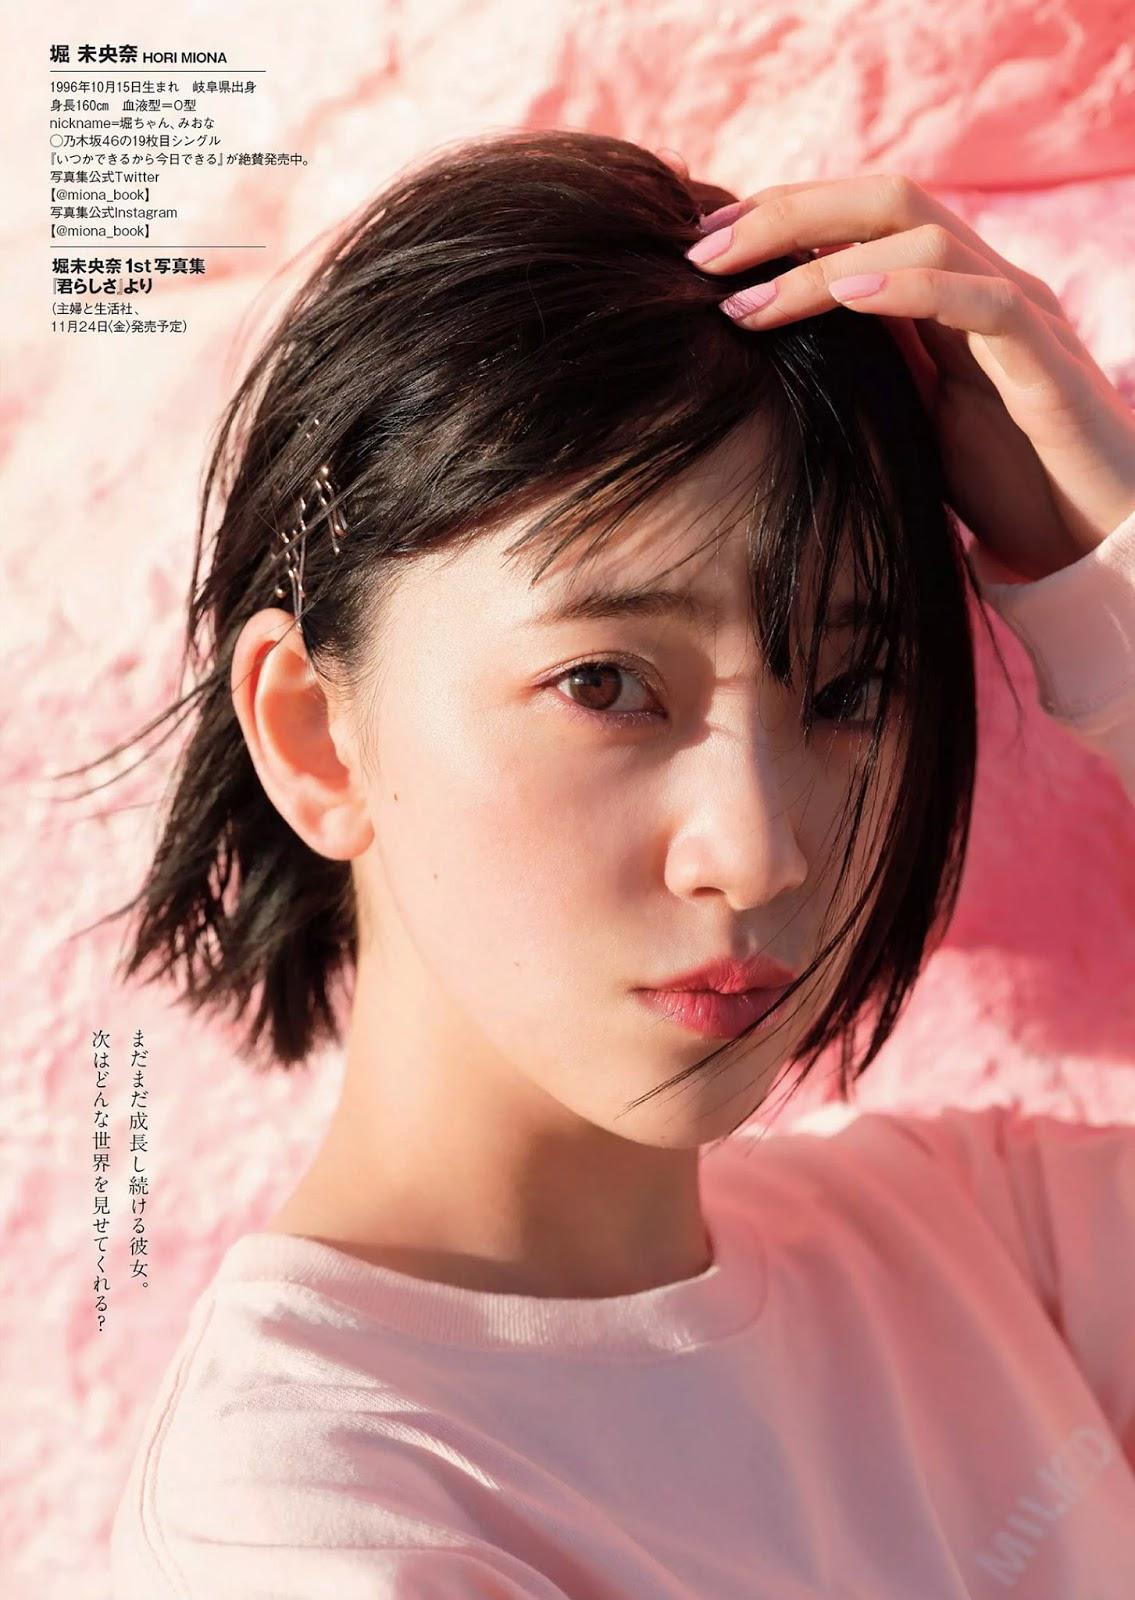 Hori Miona 堀未央奈, Weekly Playboy 2017 No.49 (週刊プレイボーイ 2017年49号)